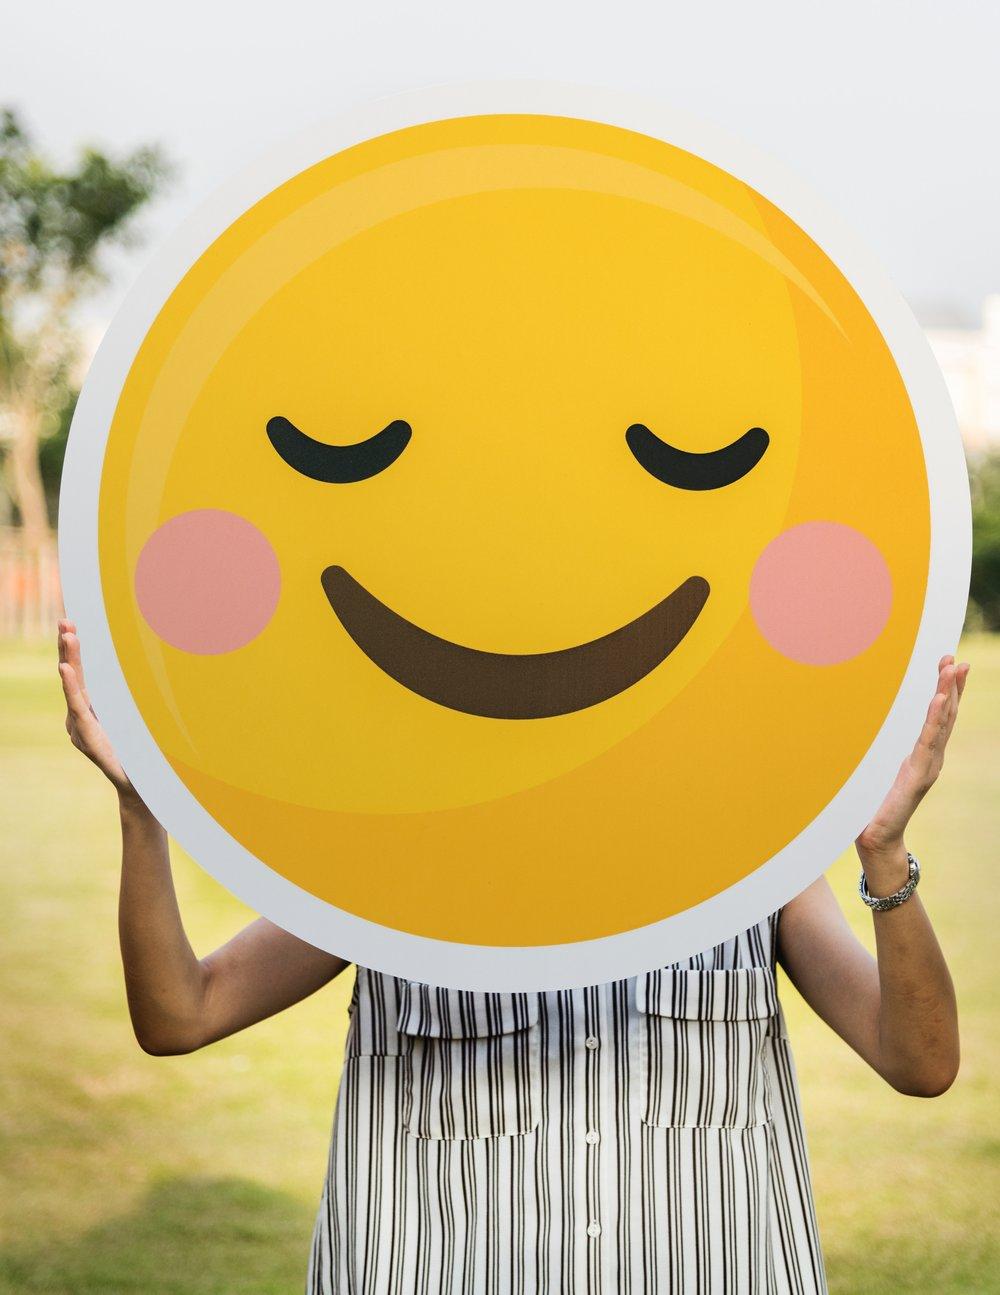 5+1 tips για να είμαστε πιο ευτυχισμένοι κάθε μέρα! -